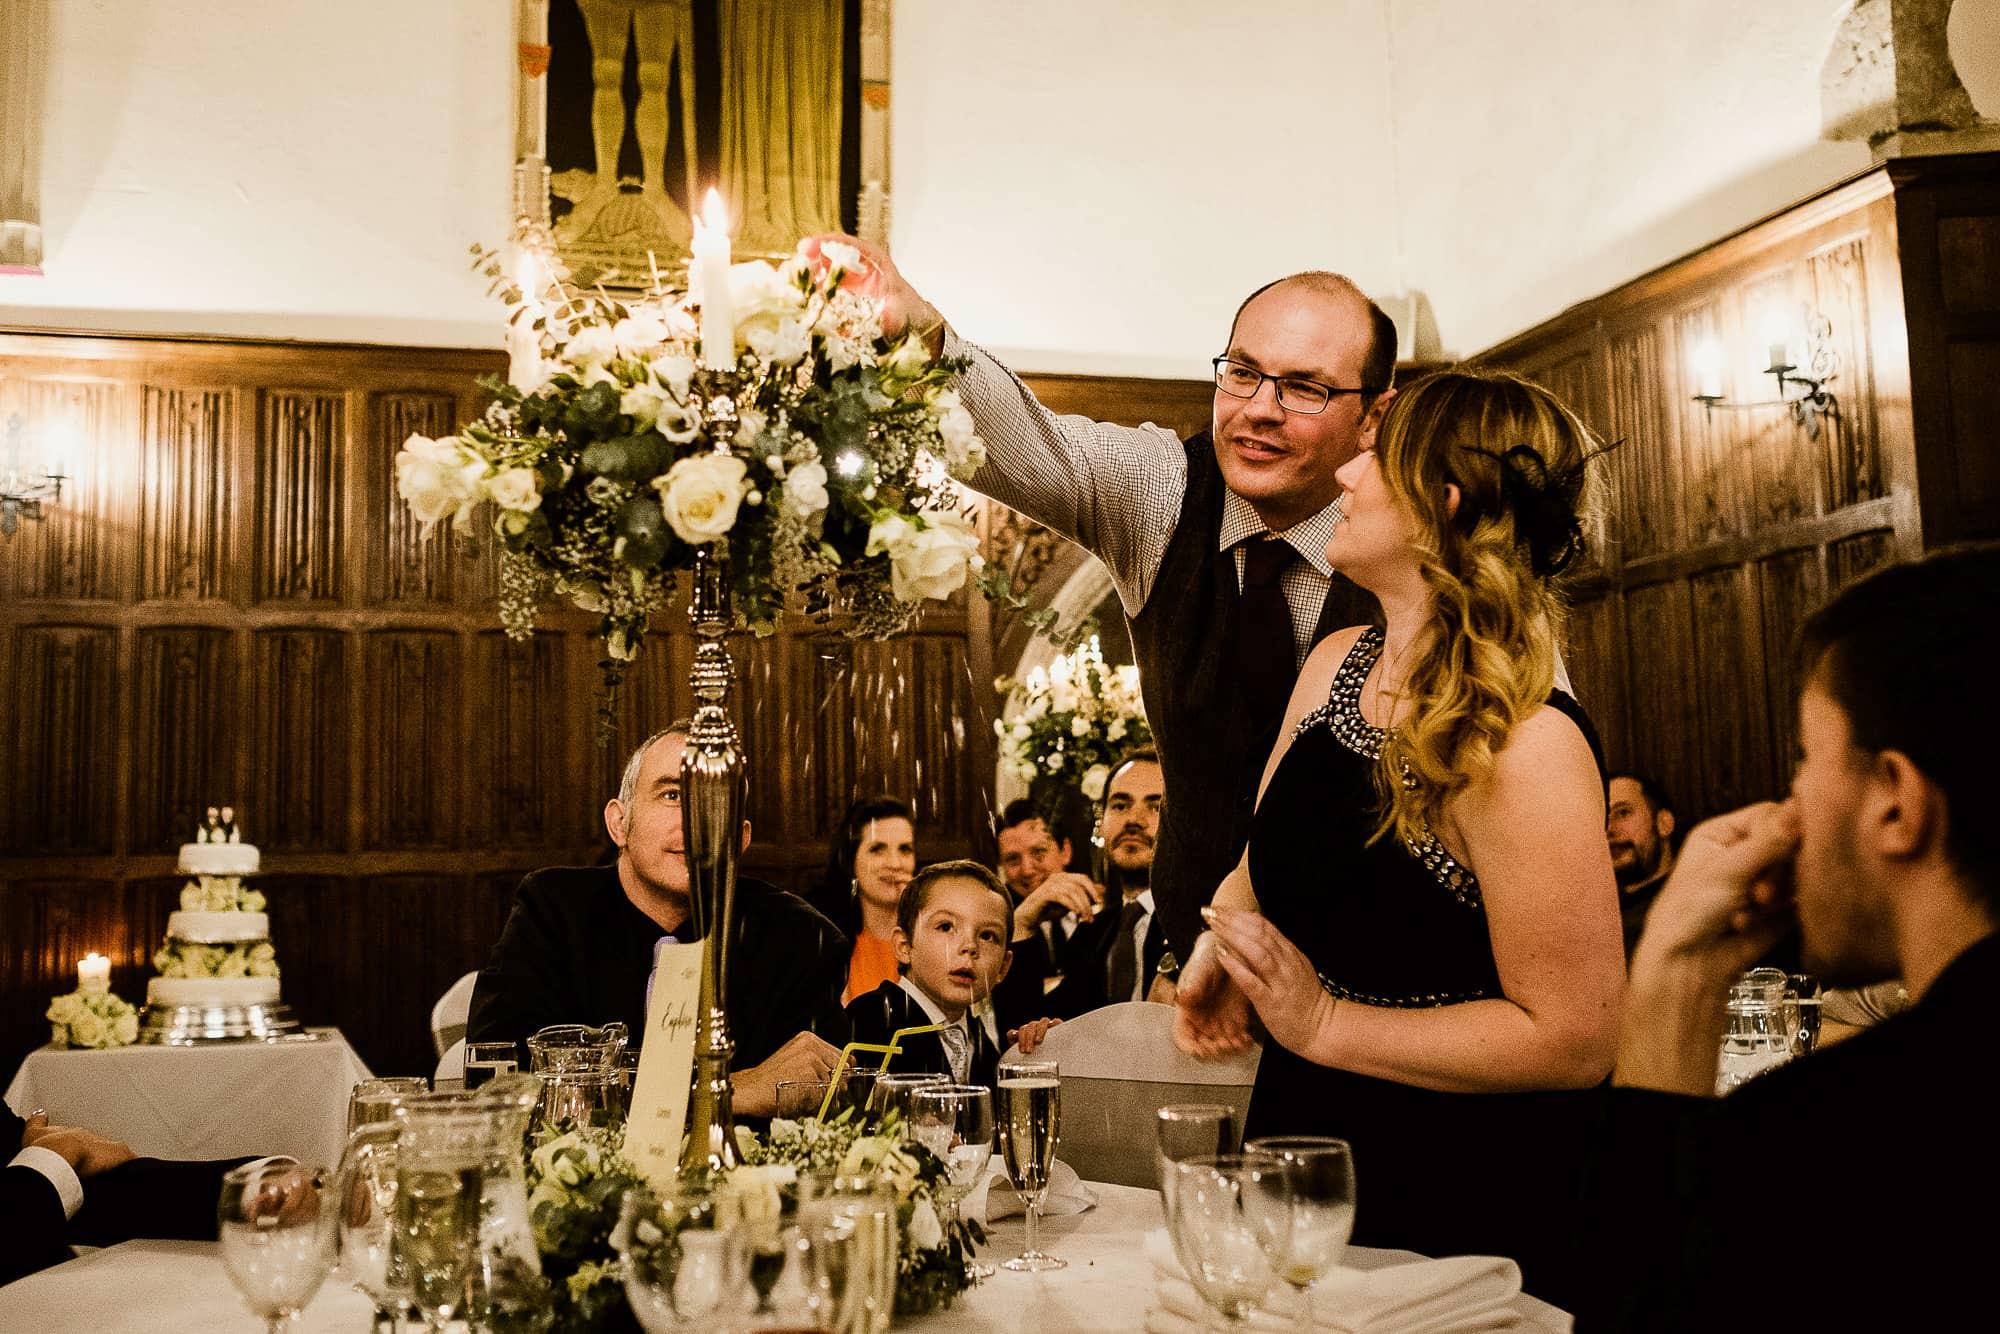 lympne-castle-wedding-photographer-matt-tyler-0029